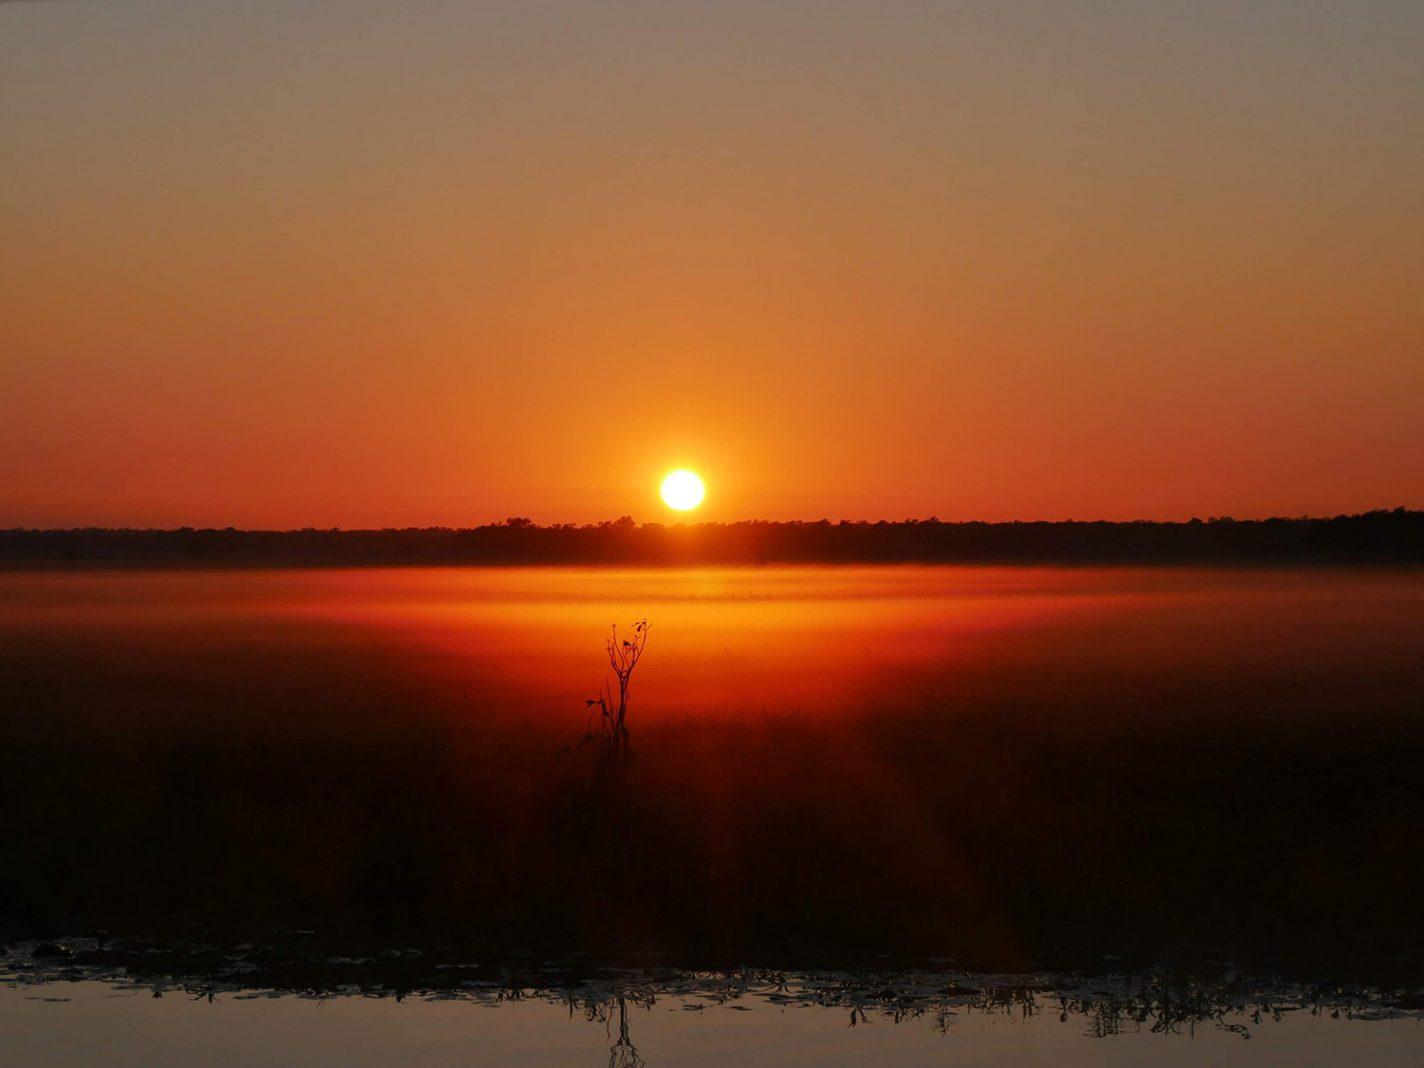 Prachtige zonsopkomst tijdens de Yellow Water Cruise in Kakadu National Park